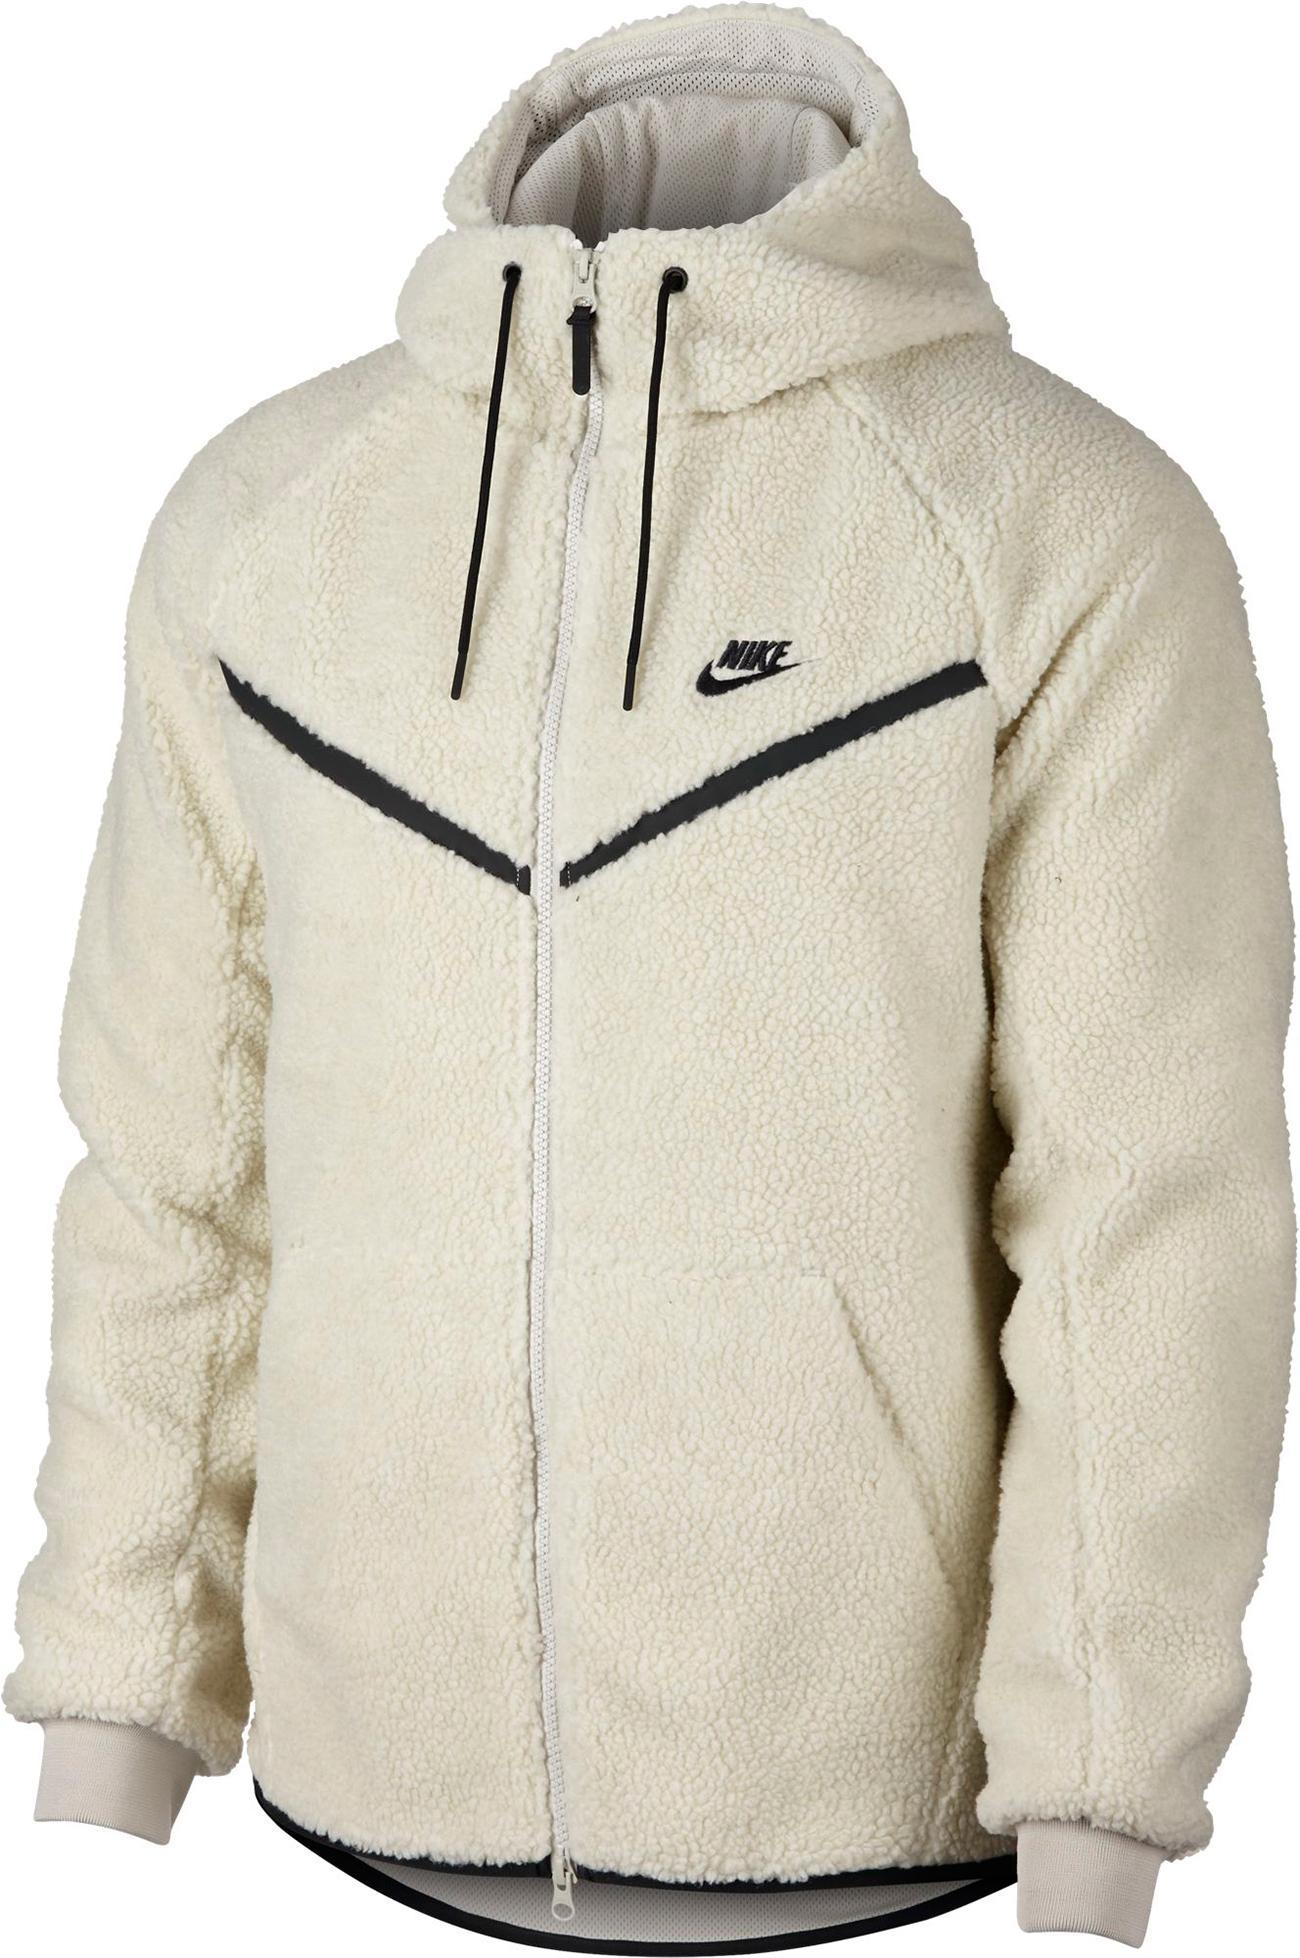 Nike jacke herren beige